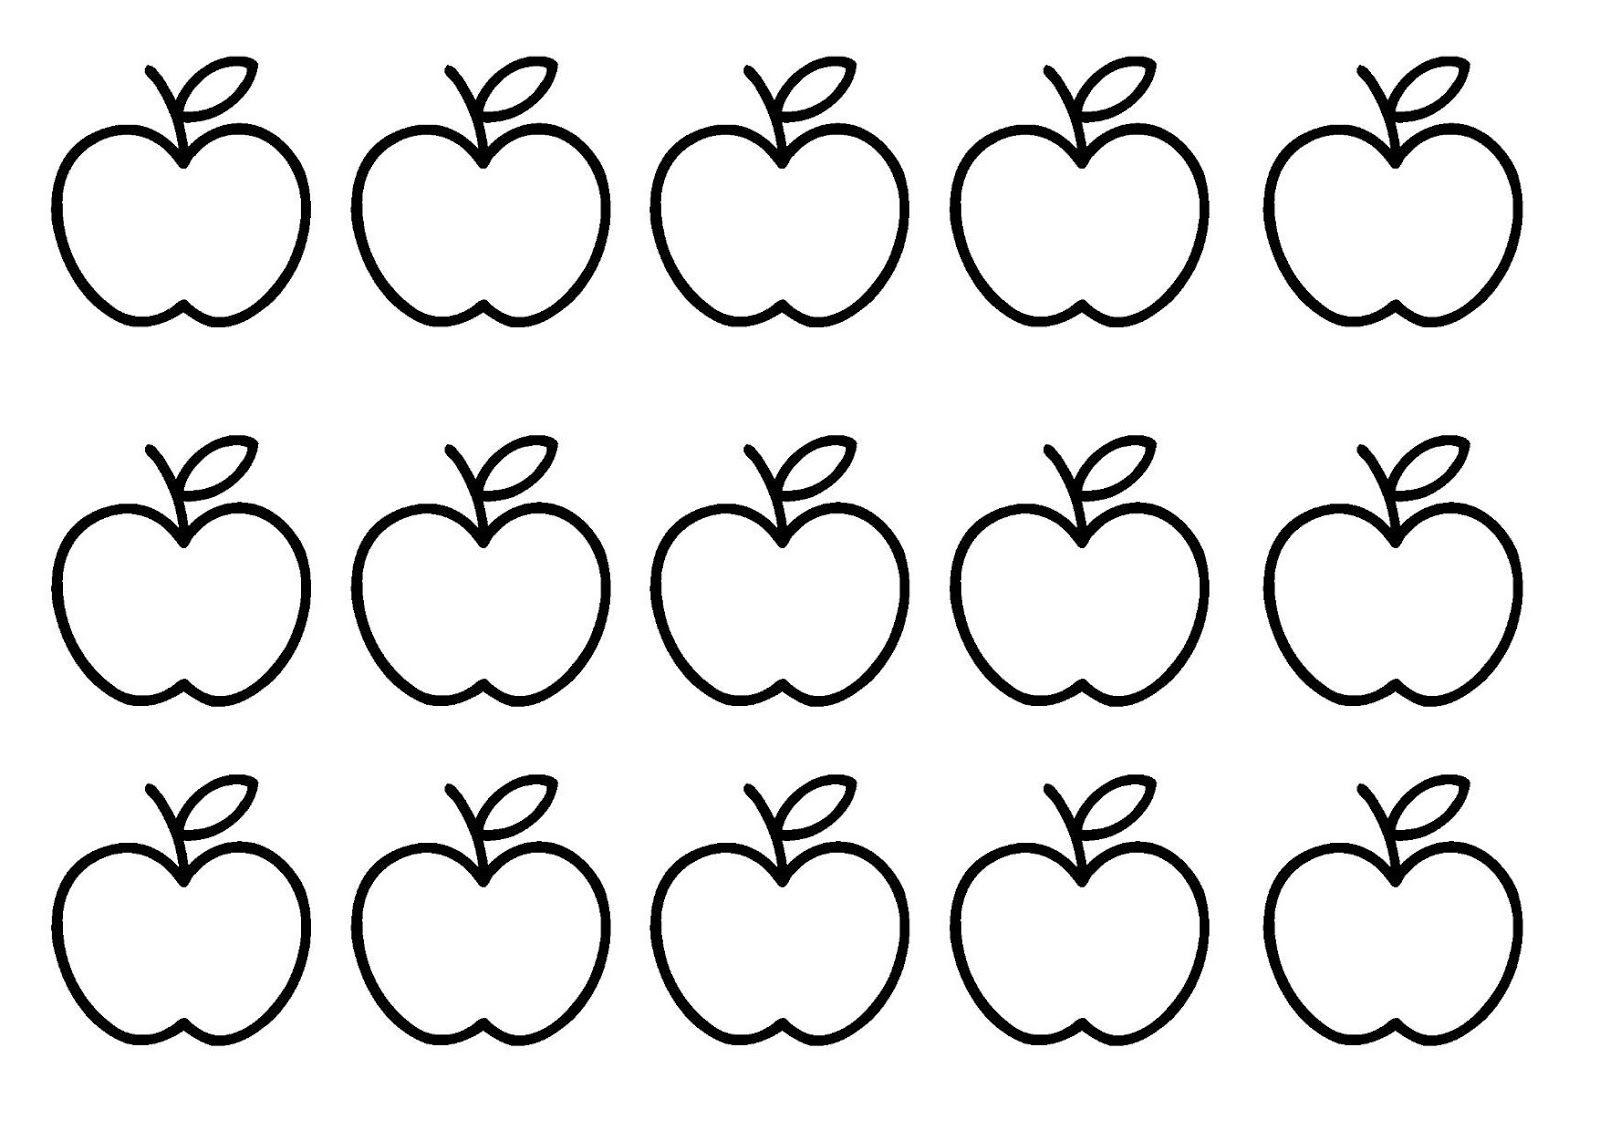 Peuterthema S Mmm Lekker Fruit Groenten Thema Herfstwerkjes